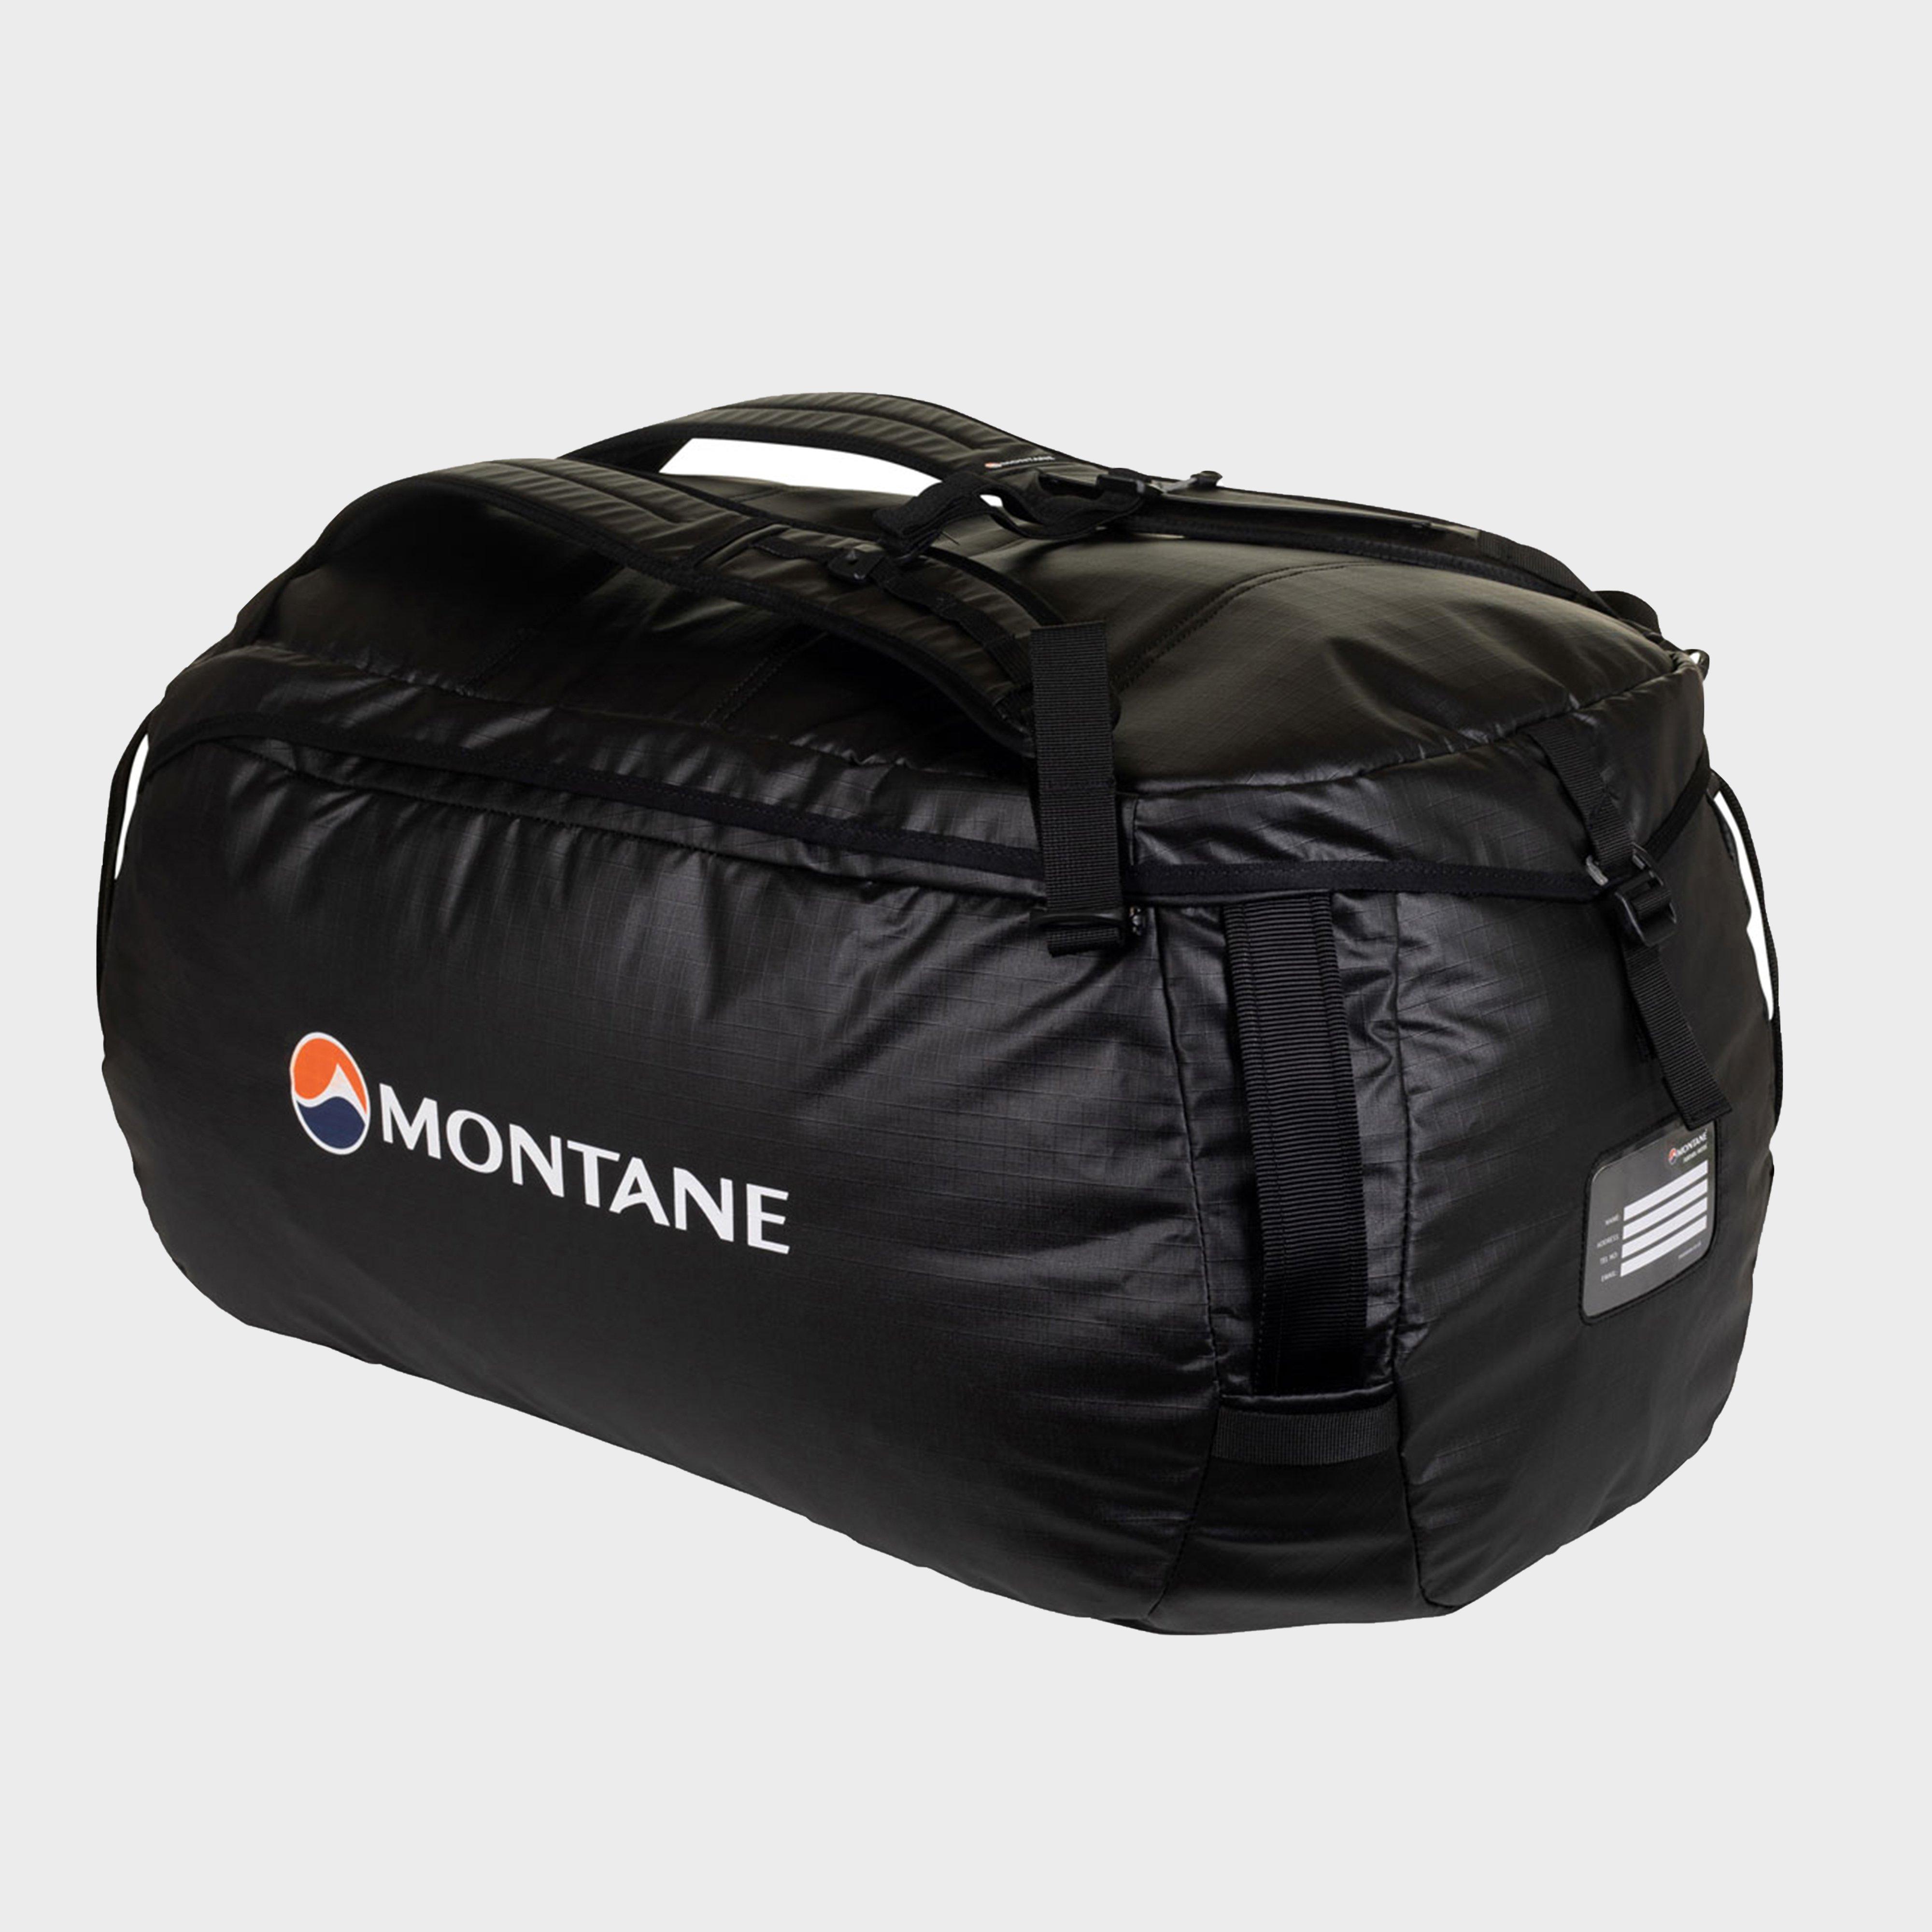 Montane Montane Transition 60 Duffle Bag